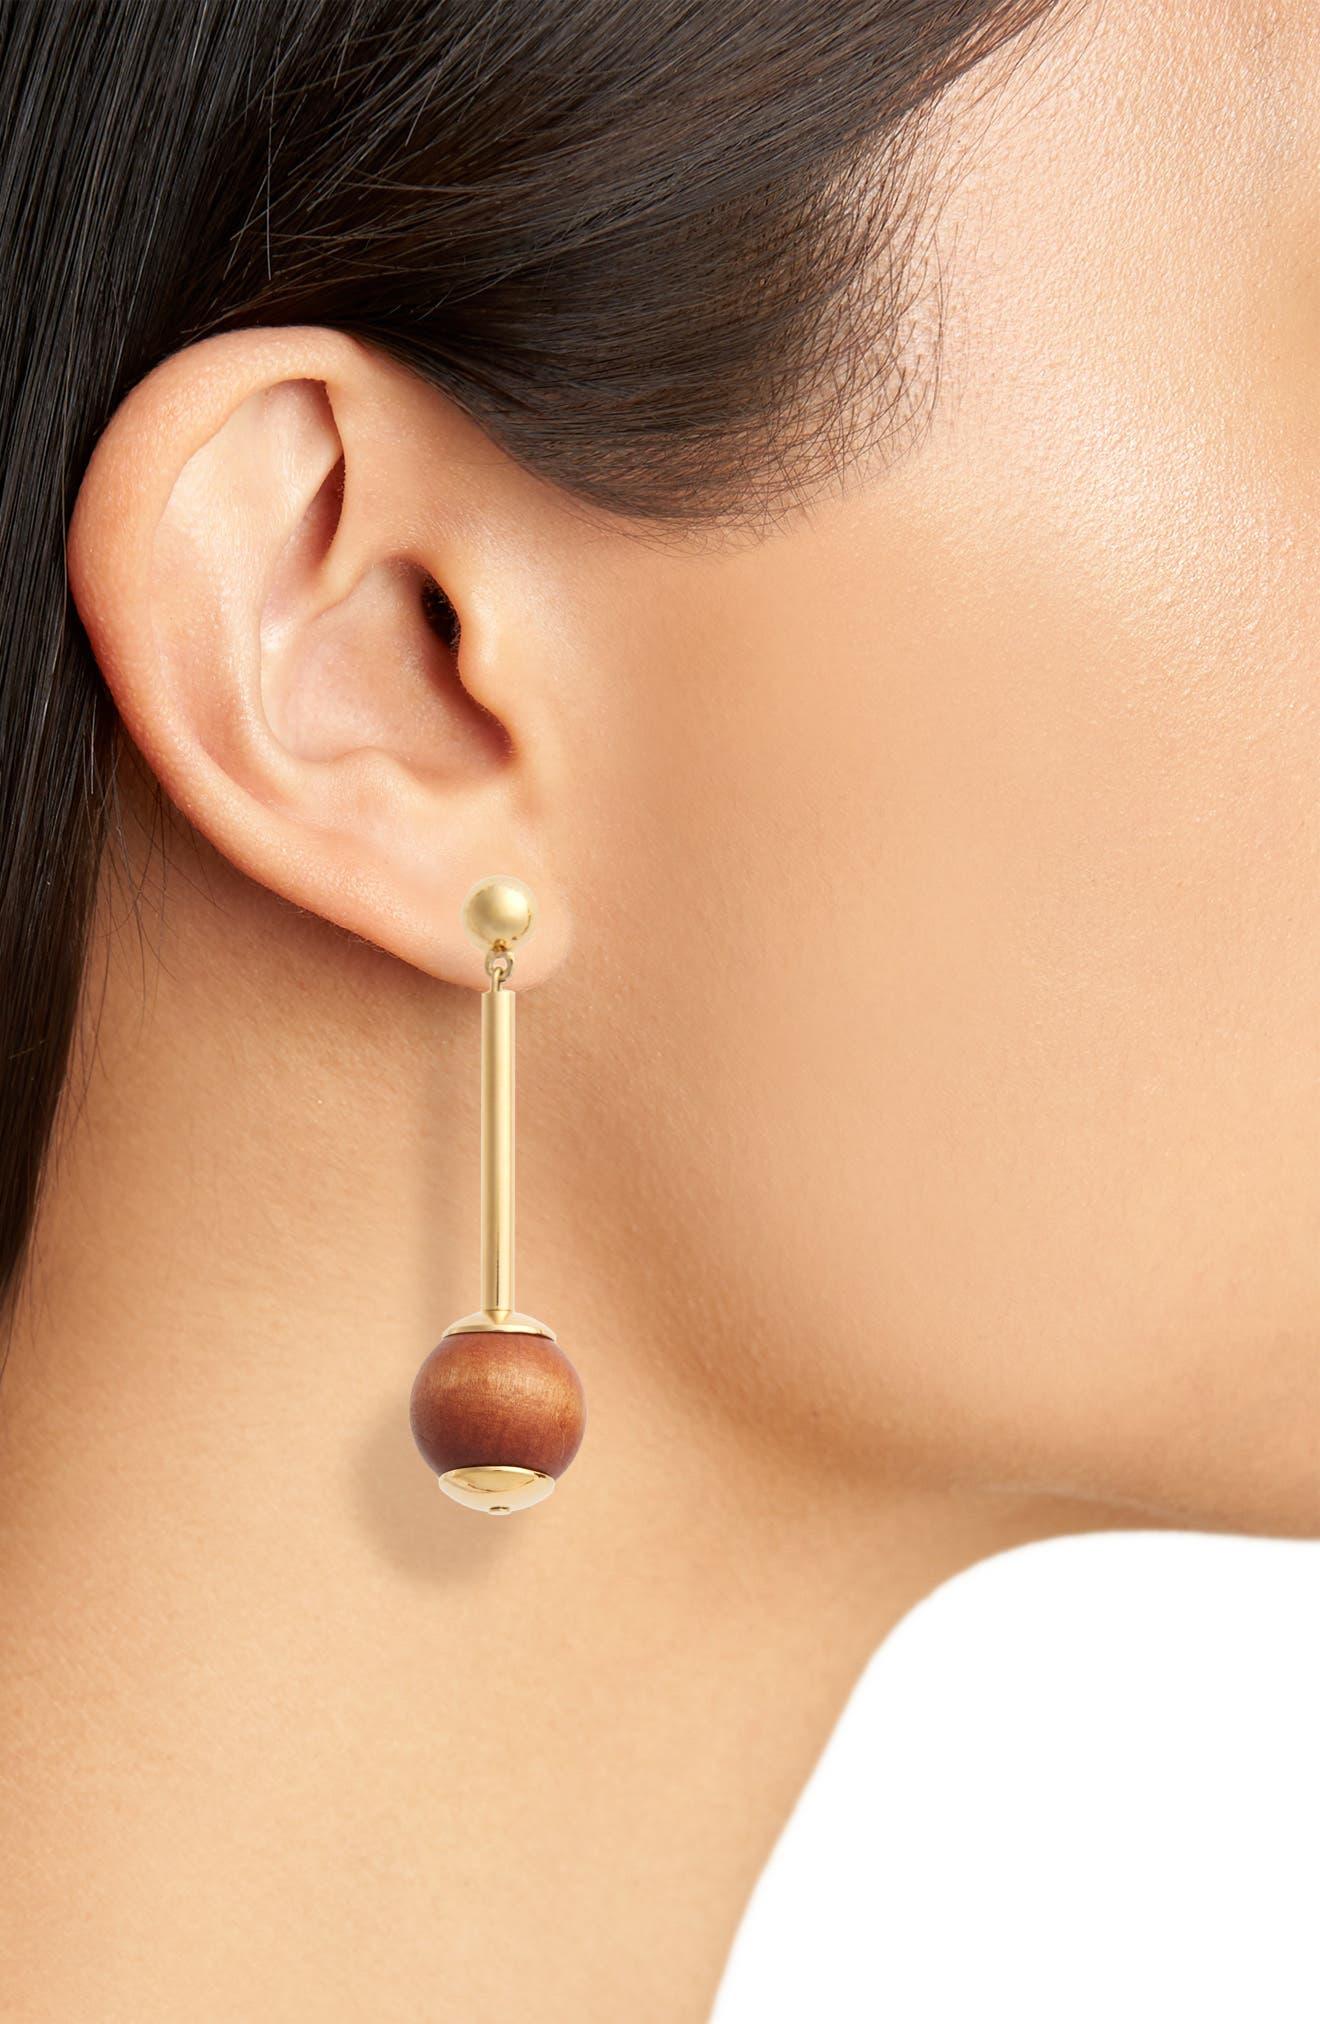 Pendulum Earrings,                             Alternate thumbnail 2, color,                             WOOD